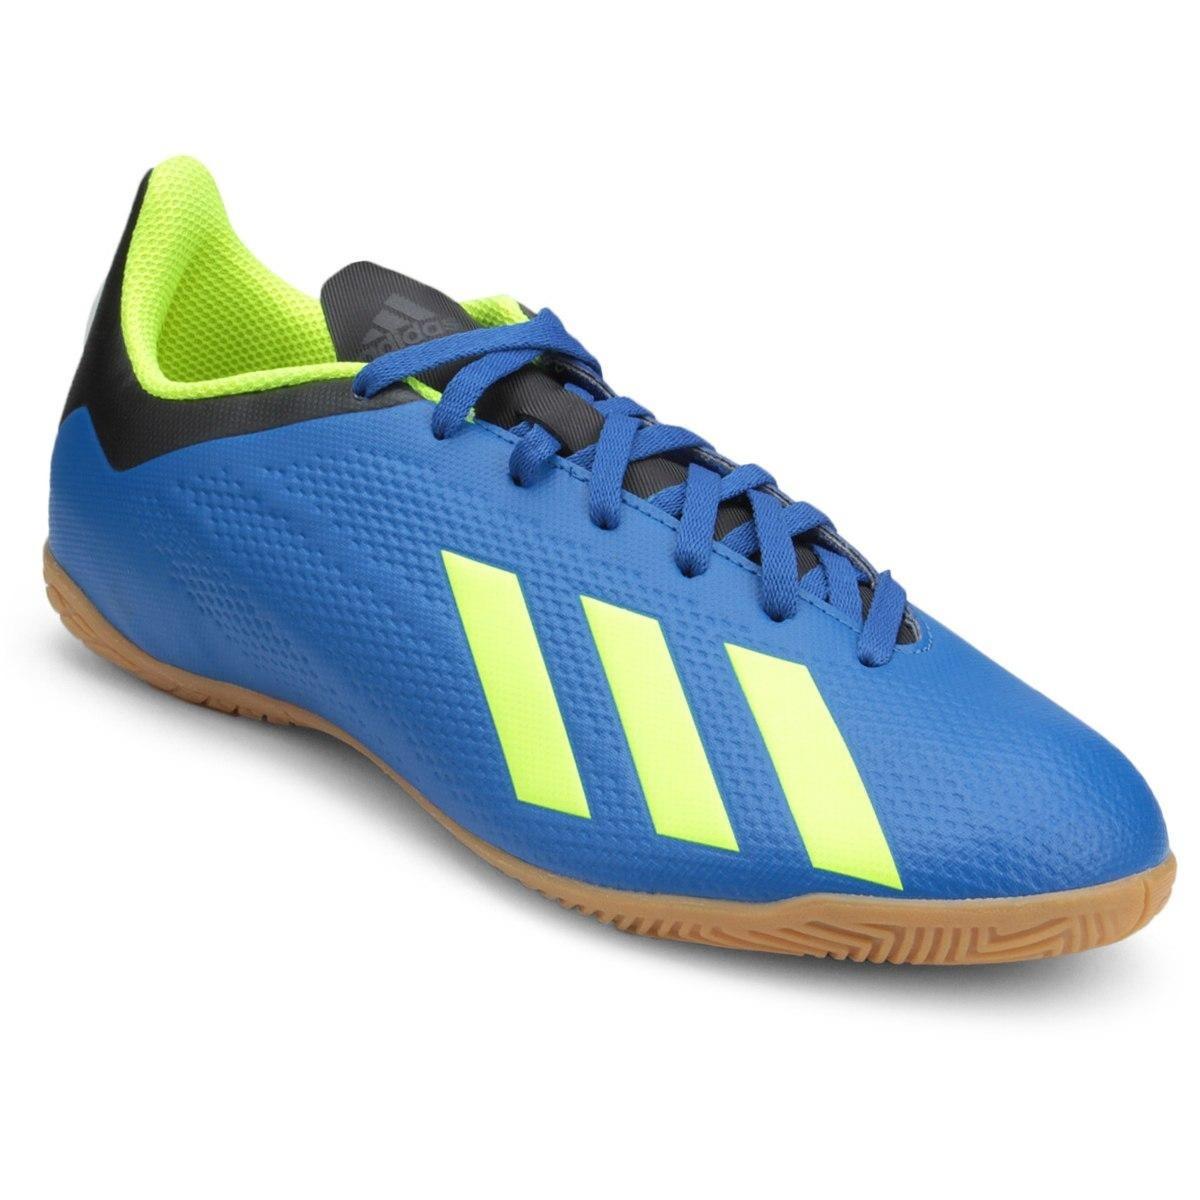 chuteira futsal adidas x tango 18.4 masculina db2482. Carregando zoom. 7ead0a5ad5487